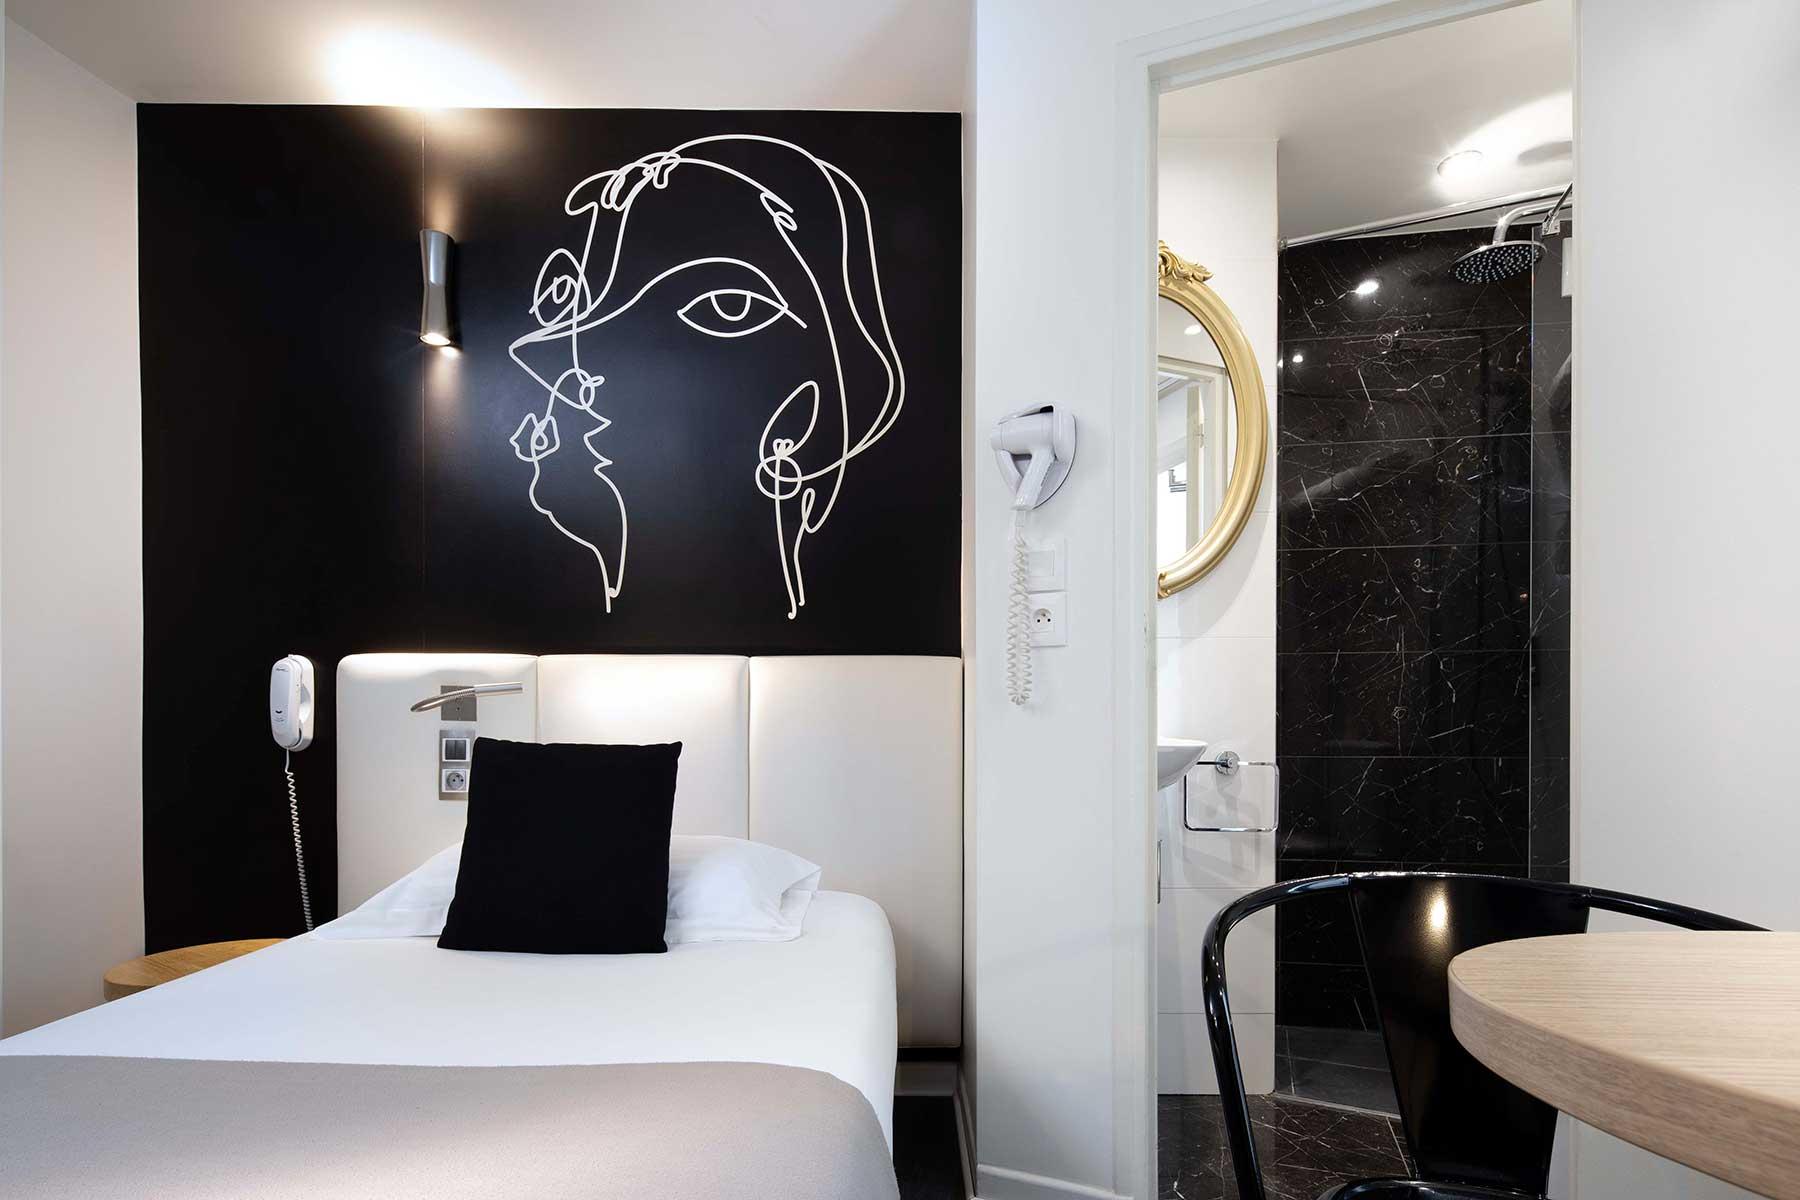 chambre-single-hotel-montparnasse-saint-germain